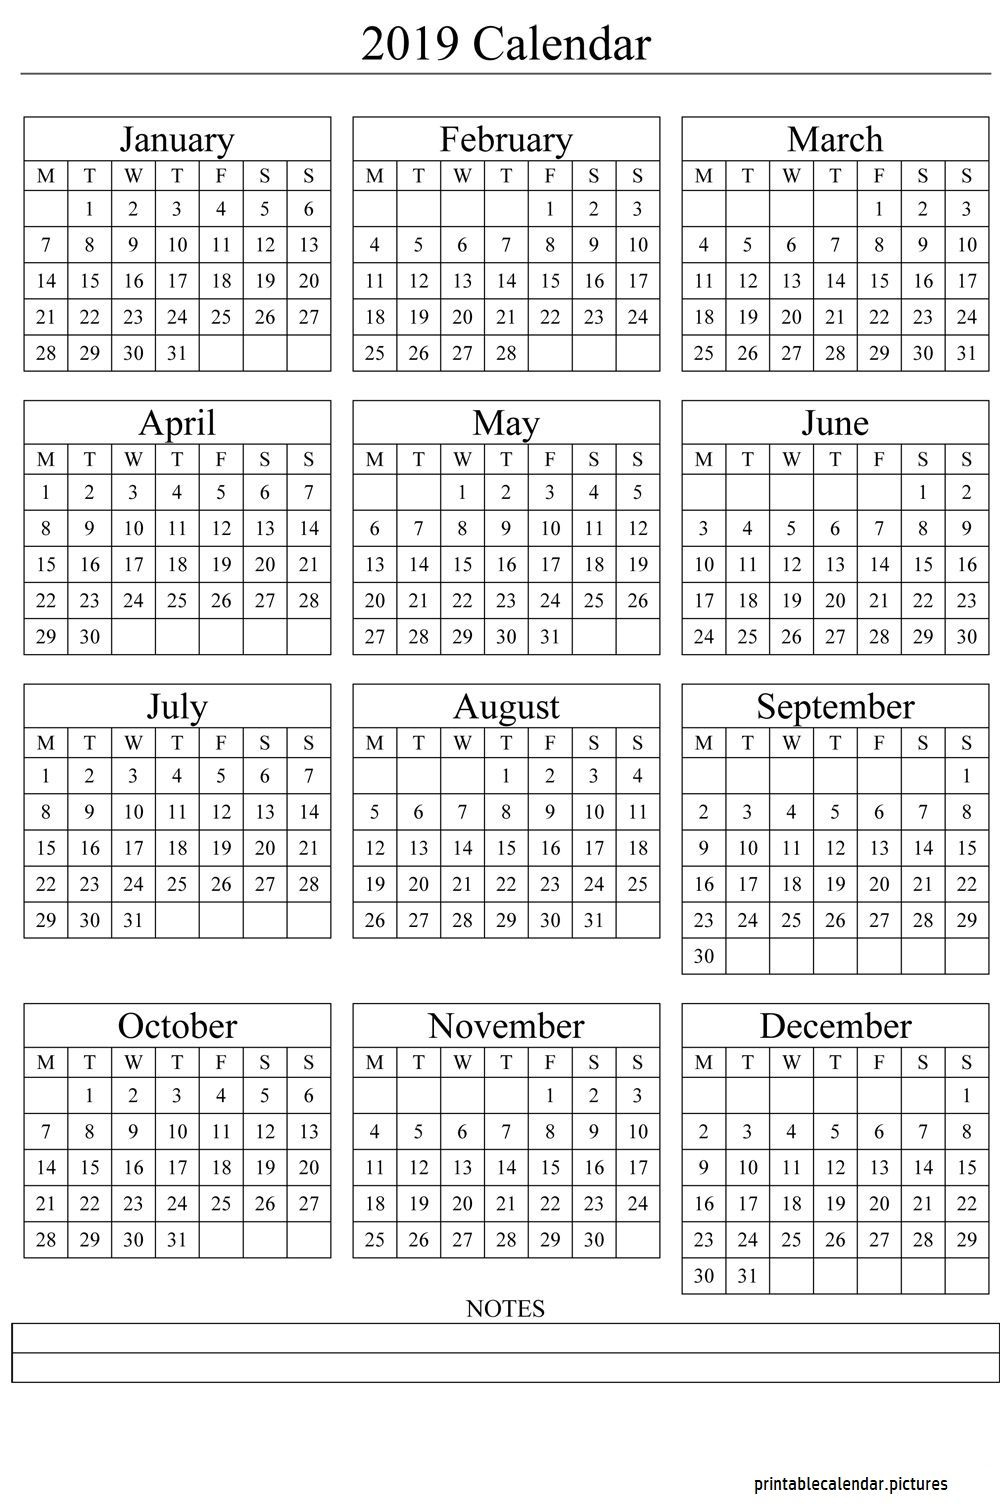 Calendar Template 2019 | Printable Yearly Calendar, Free Within Flanders Family 2020 Academic Calendar  2021